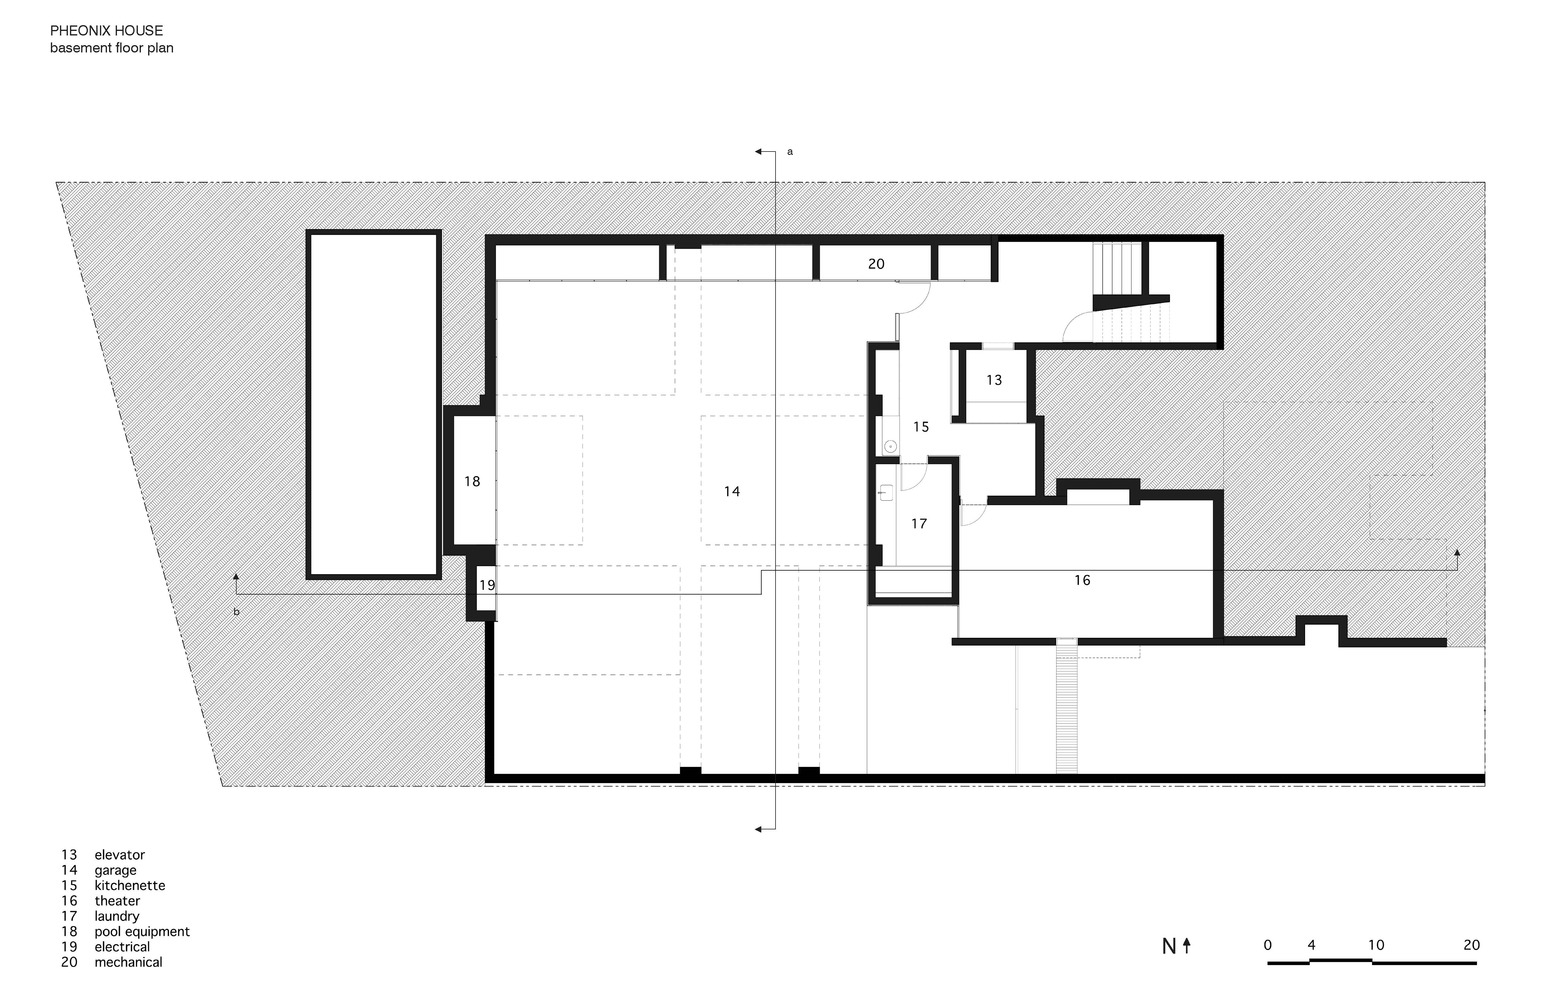 medium resolution of phoenix house sebastian mariscal studio basement plan